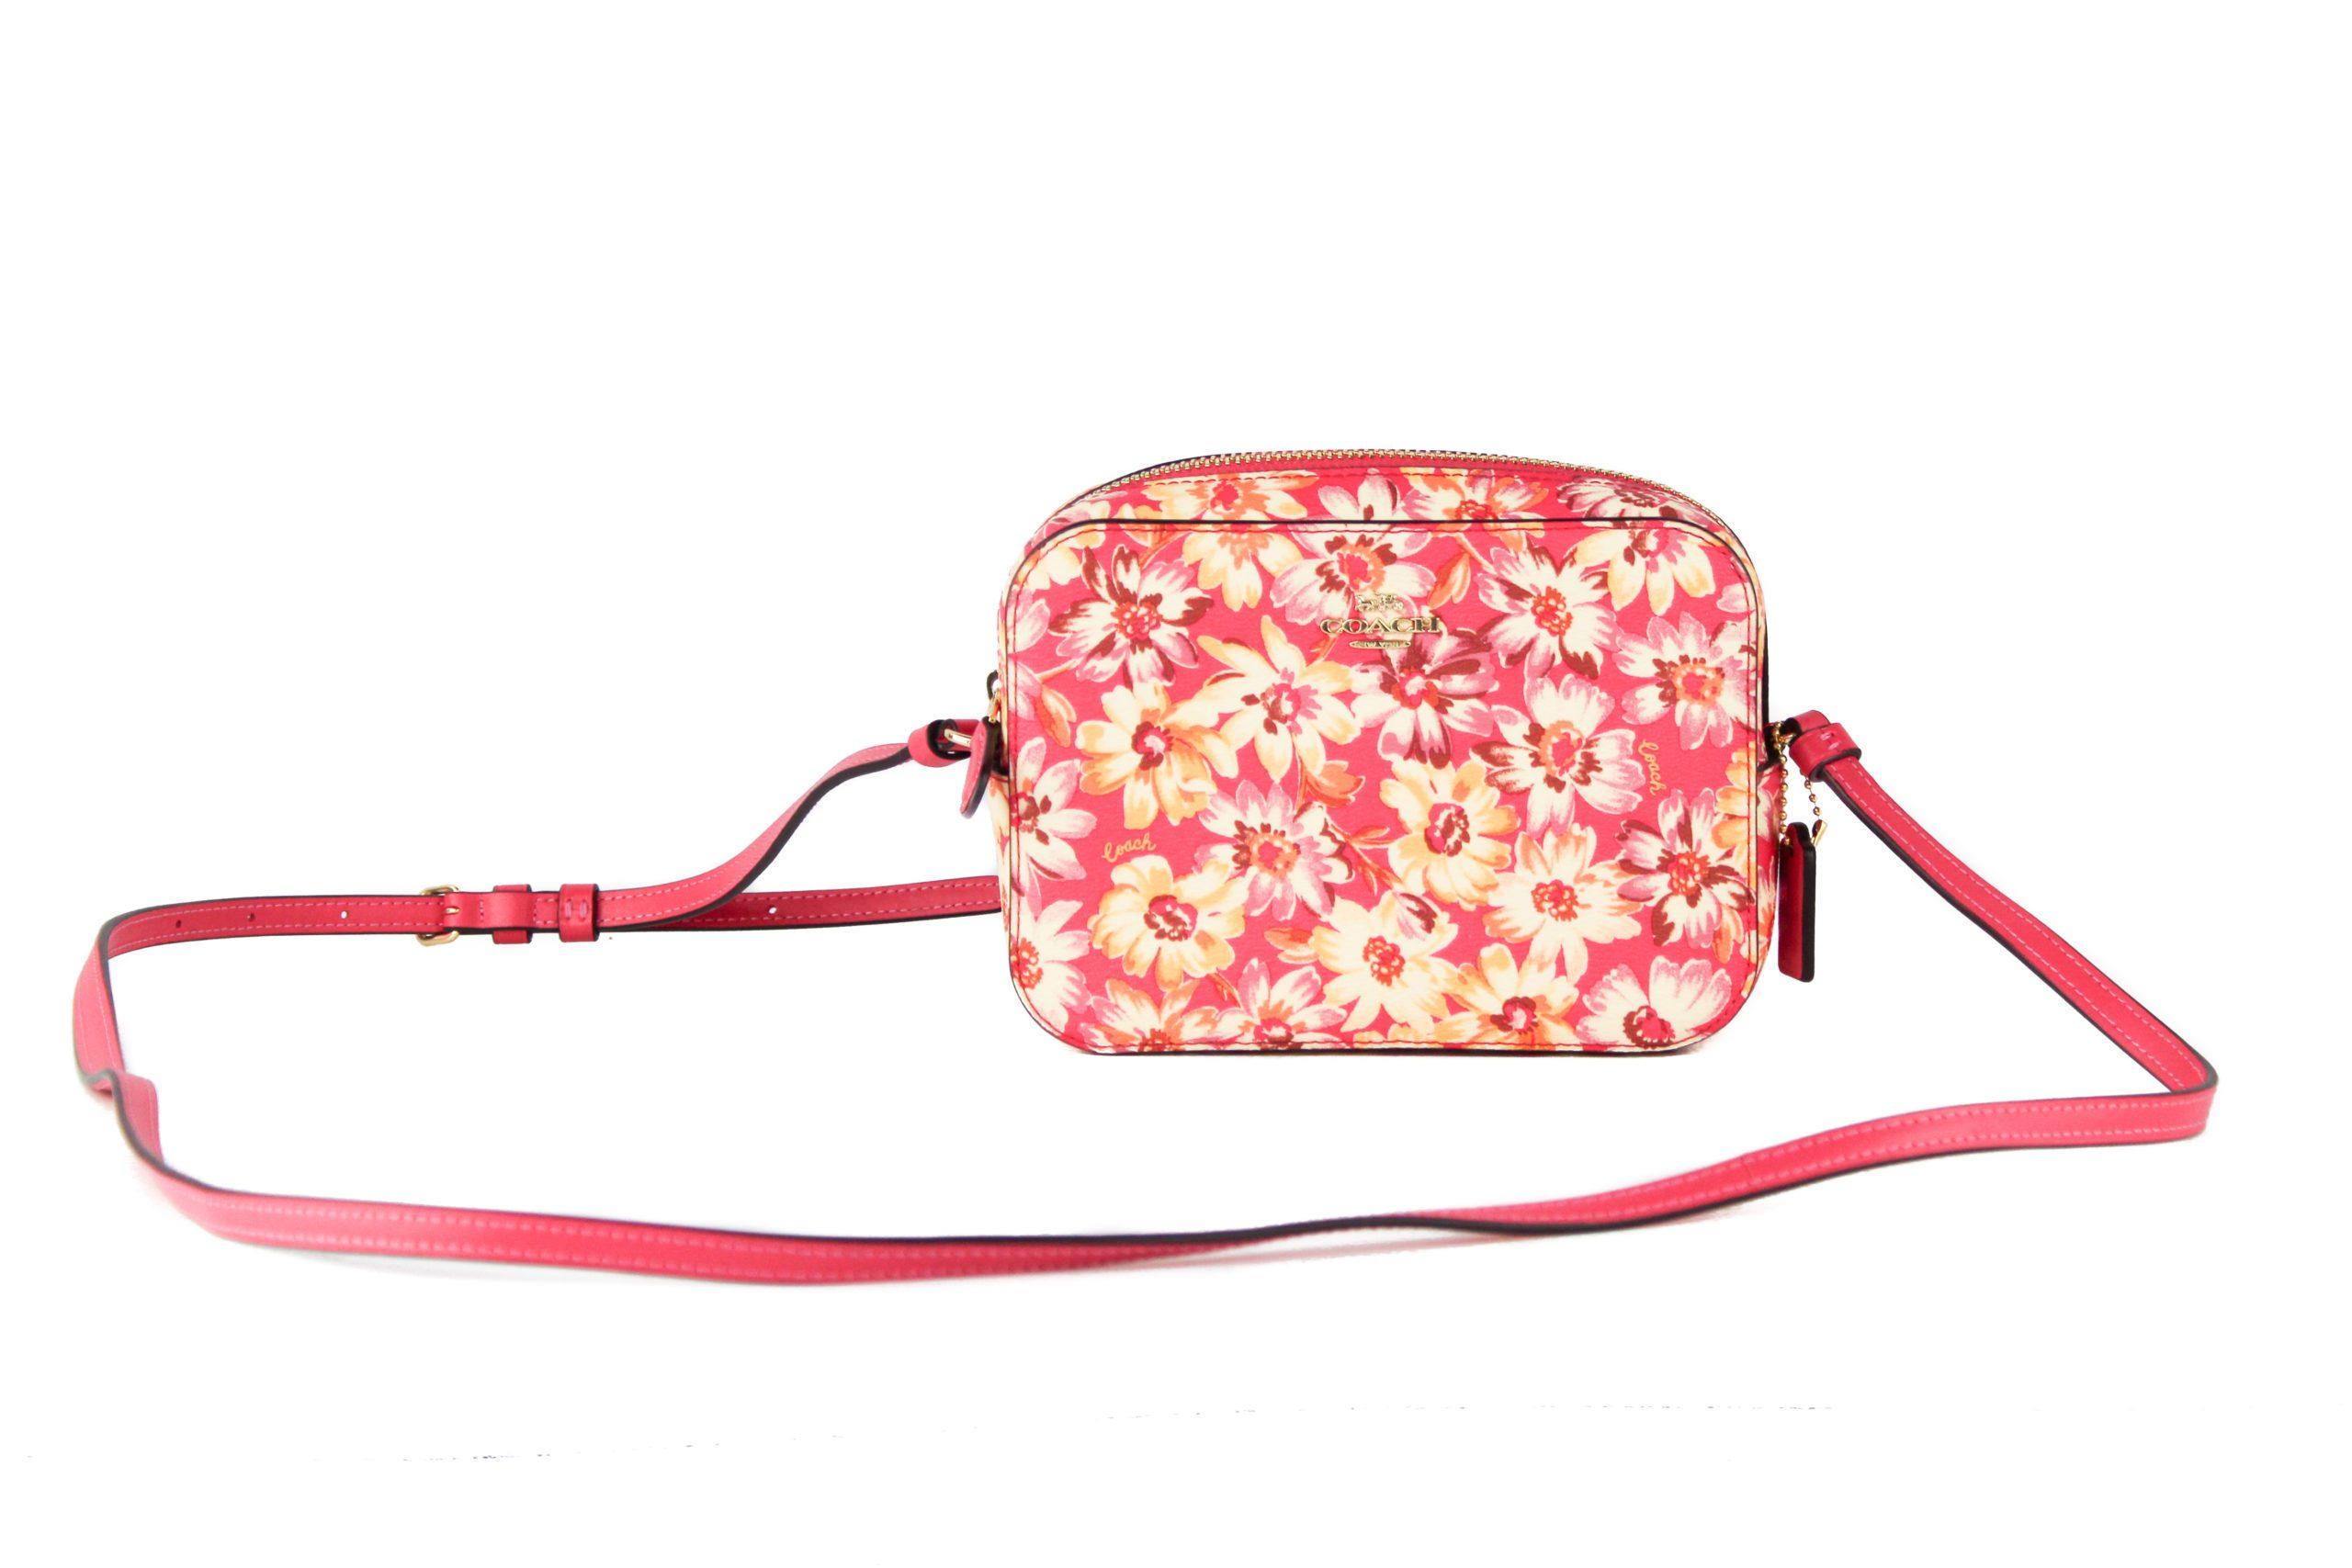 COACH Women's Canvas Leather Crossbody Bag Pink 85759